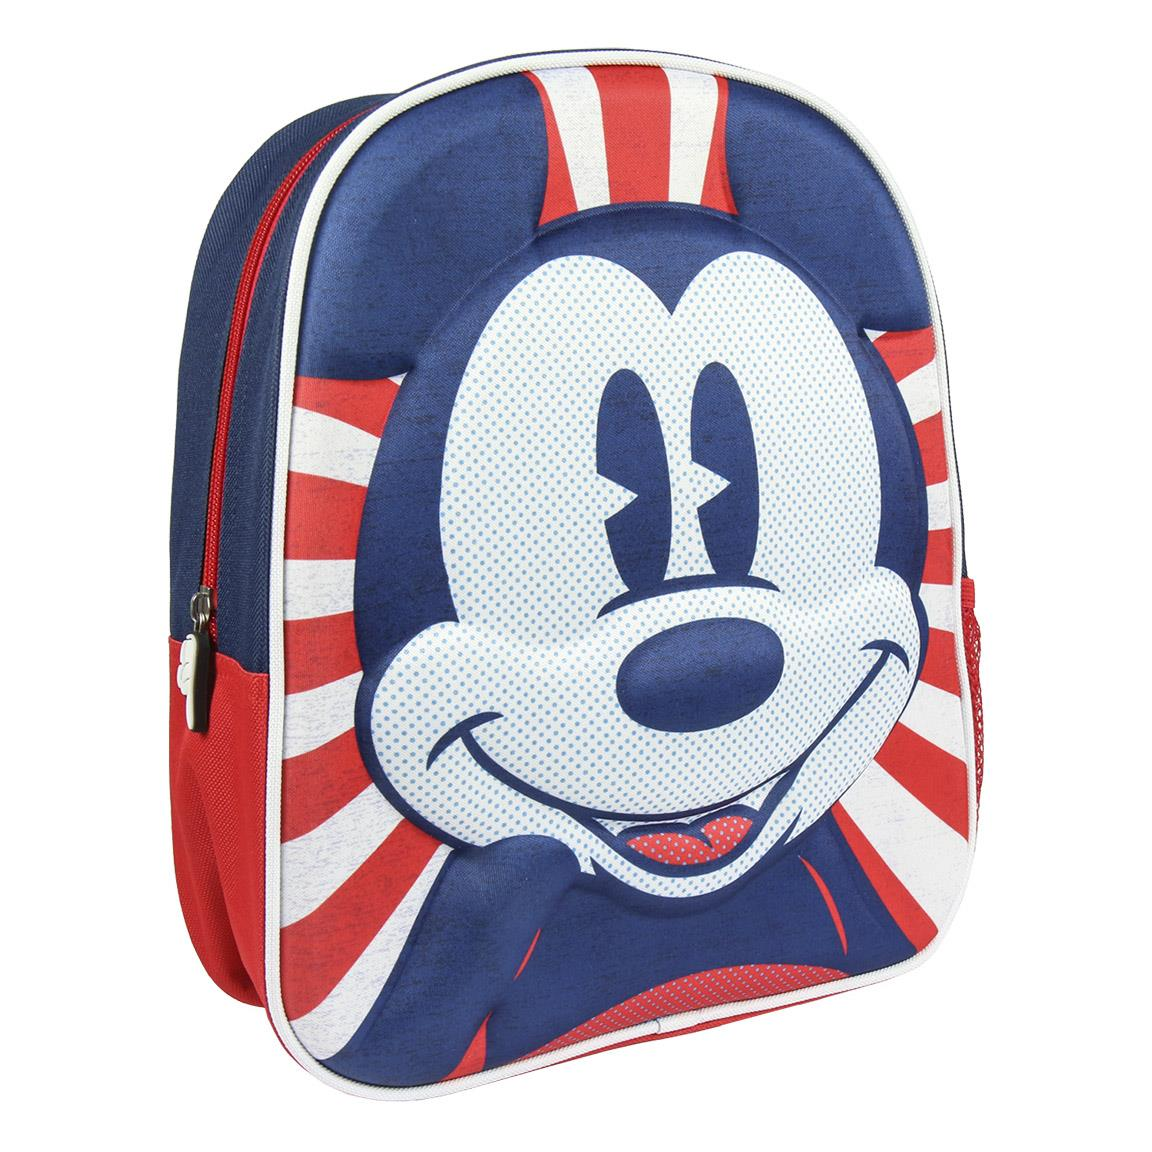 Rucsac cerda mickey mouse 3d, 25x31x10 cm imagine